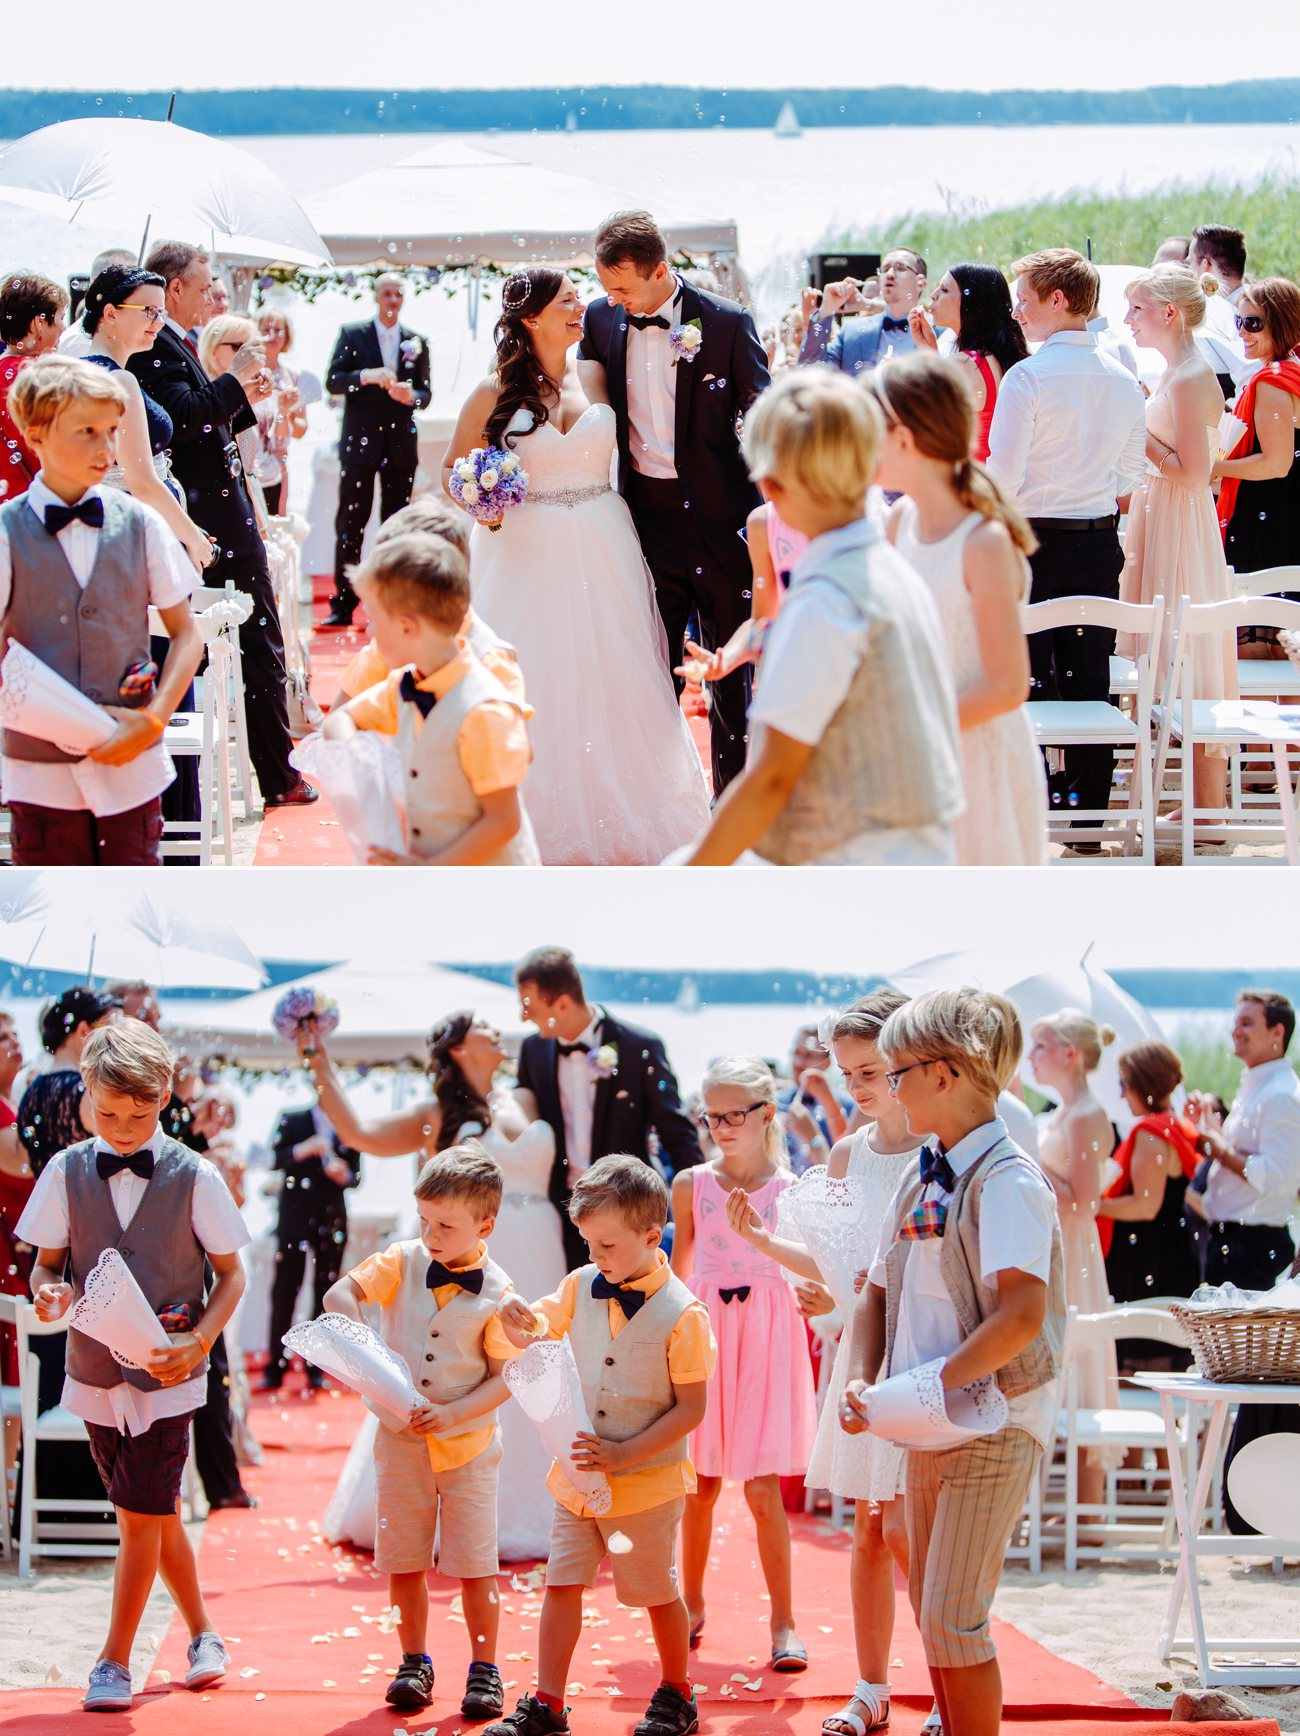 Hochzeitsfotograf_A-Rosa_Scharmuetzelsee051